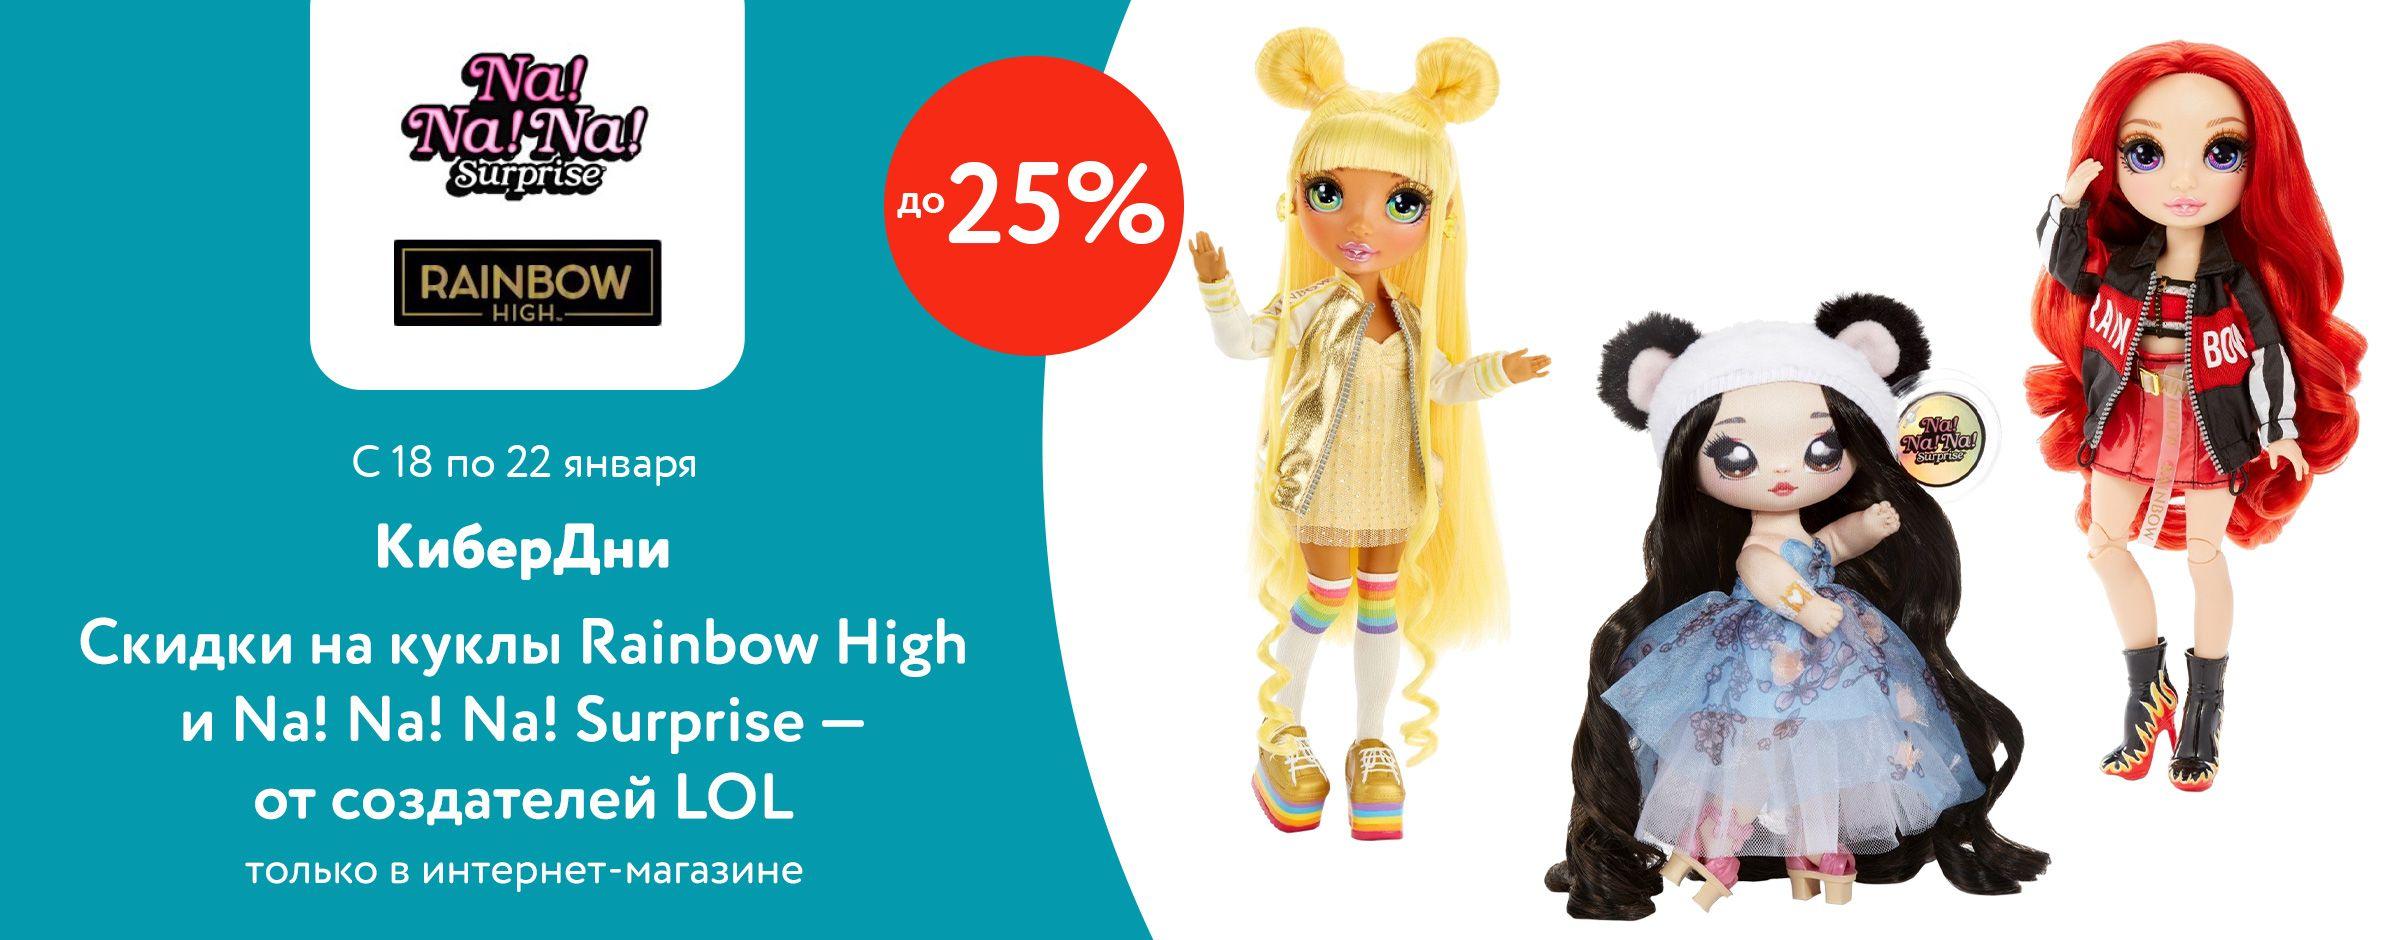 До 25% на куклы Rainbow High и Na! Na! Na! Surprise статика